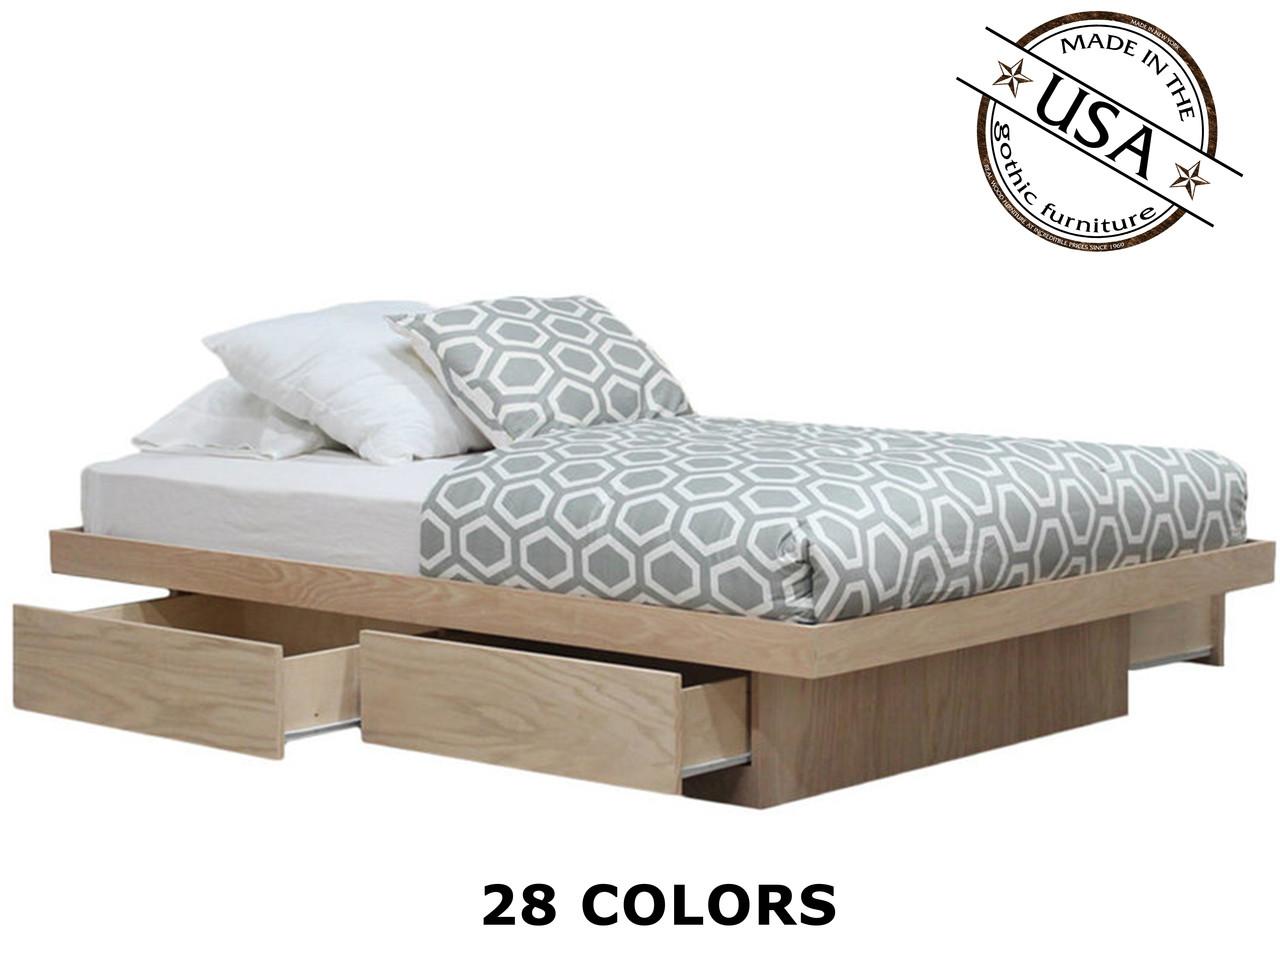 queen platform bed with 4 drawers on tracks oak wood gothic furniture. Black Bedroom Furniture Sets. Home Design Ideas